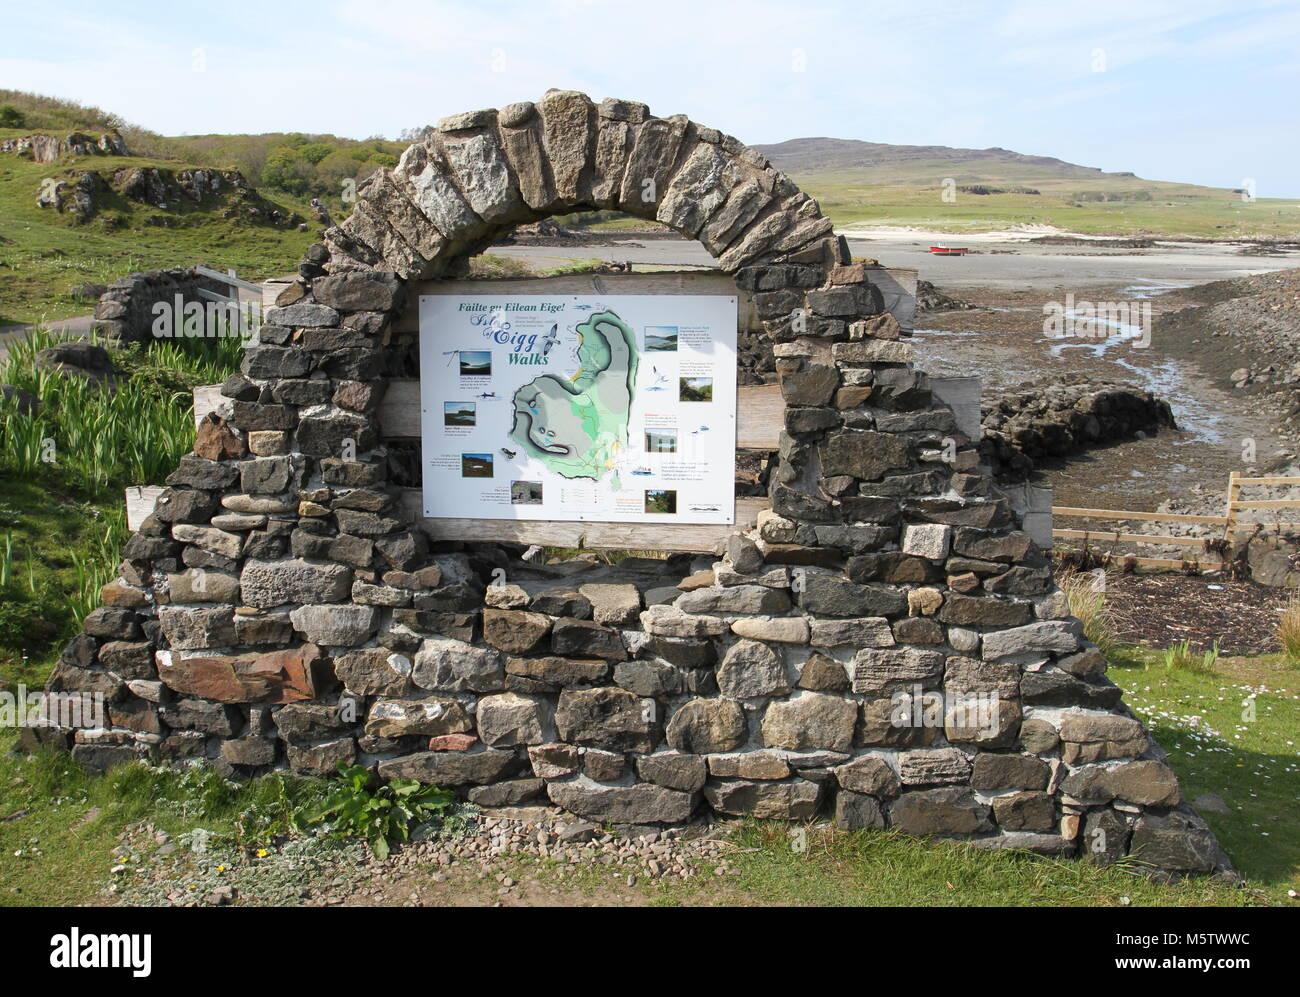 Map Of Walking Paths On Isle Of Eigg Scotland May 2012 Stock Photo